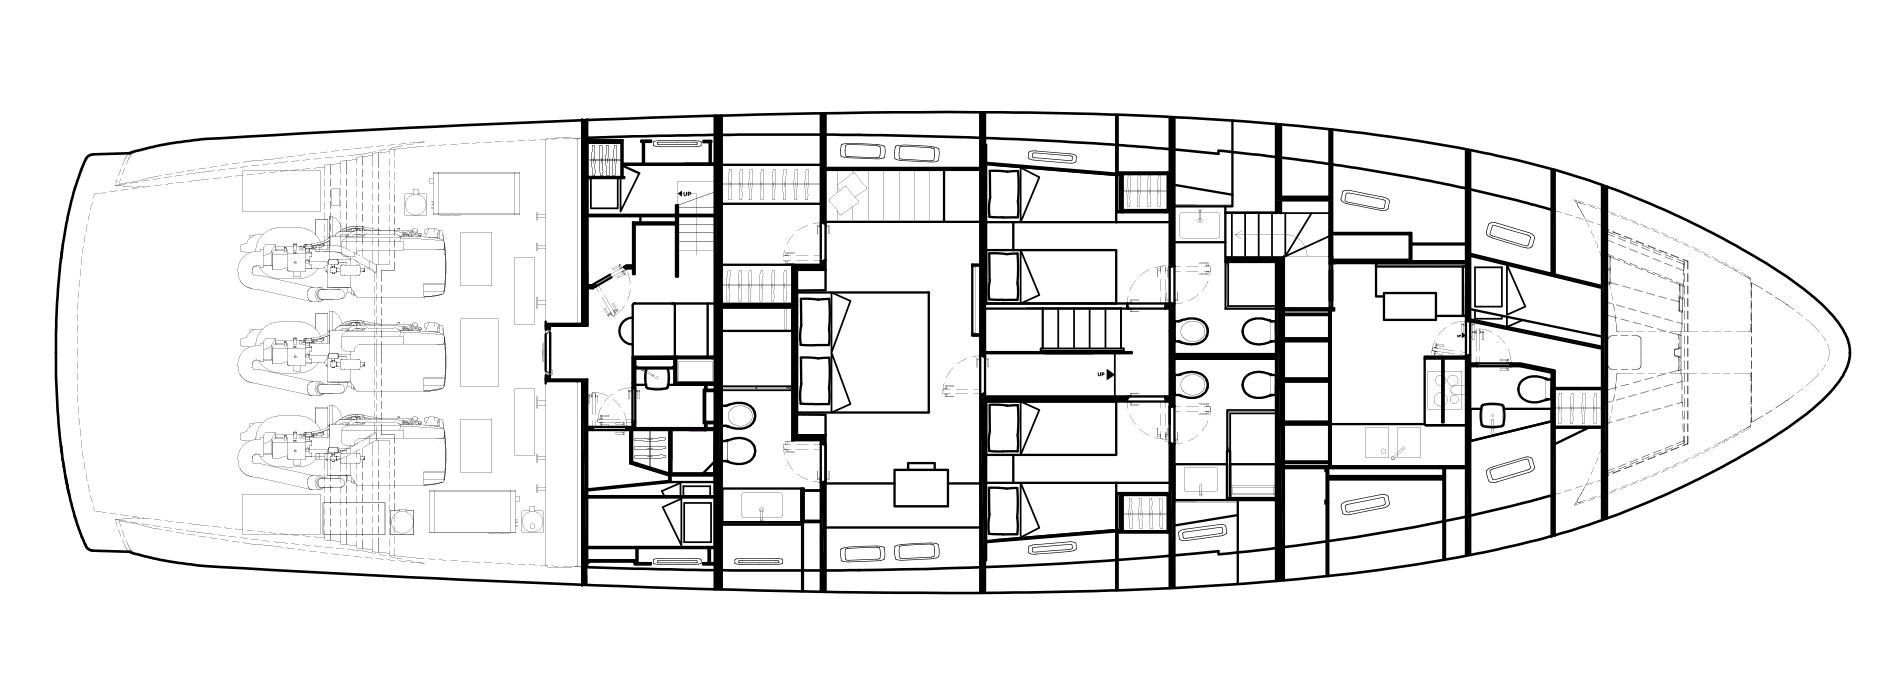 Sanlorenzo Yachts SX88 Нижняя палуба версия C